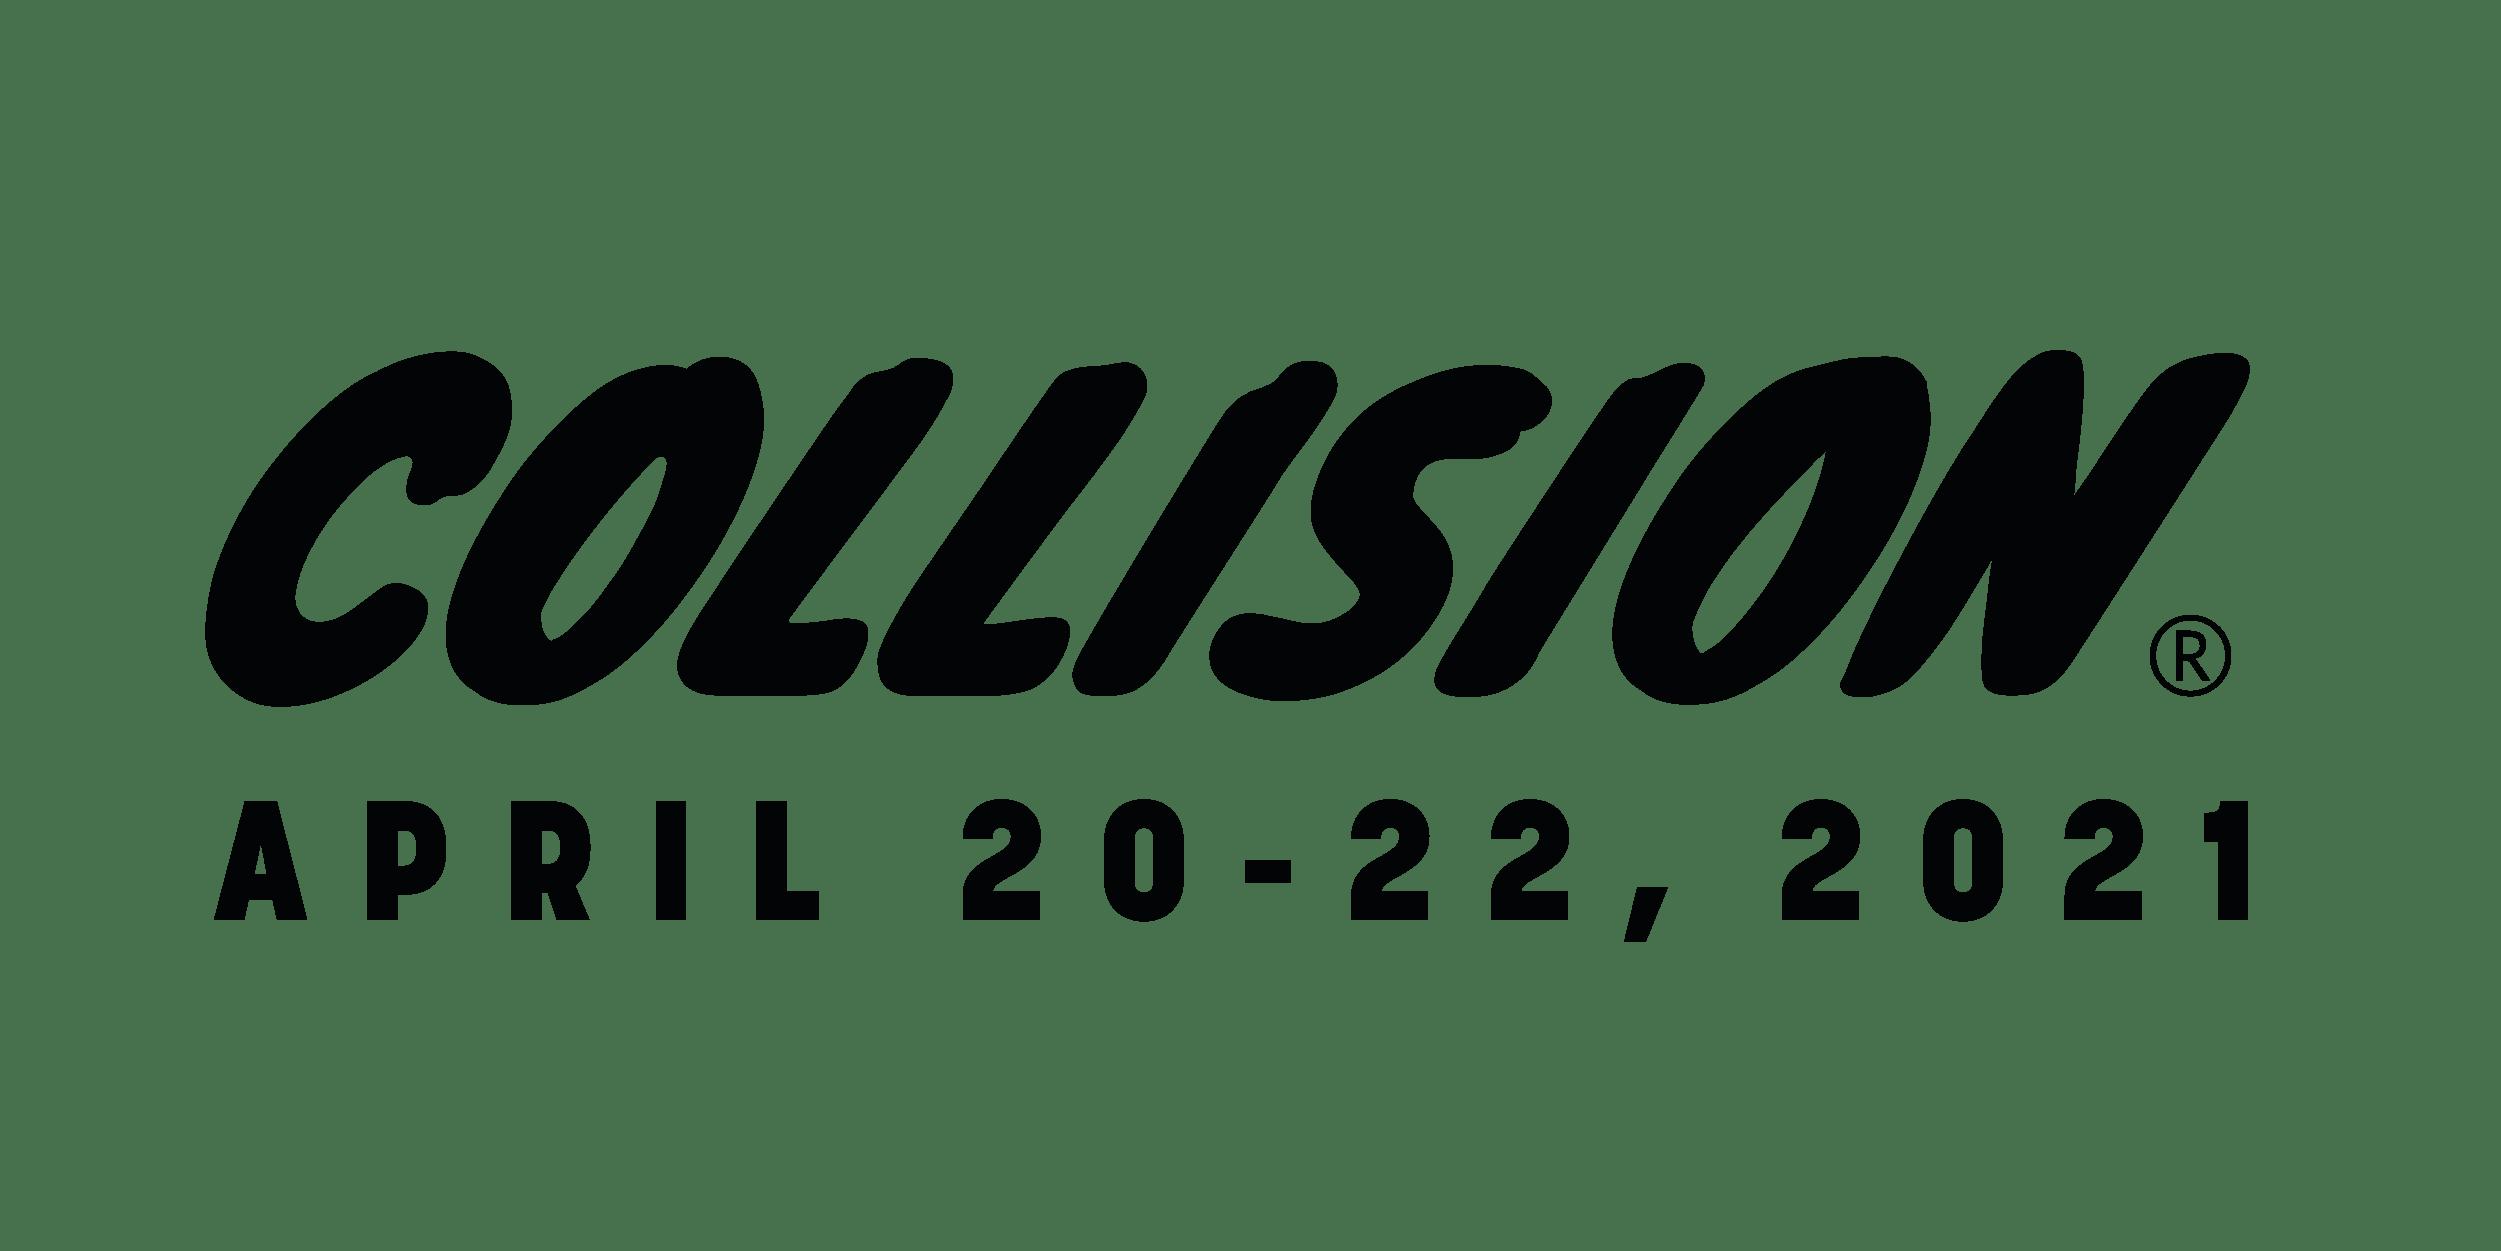 Collision Logo 2021